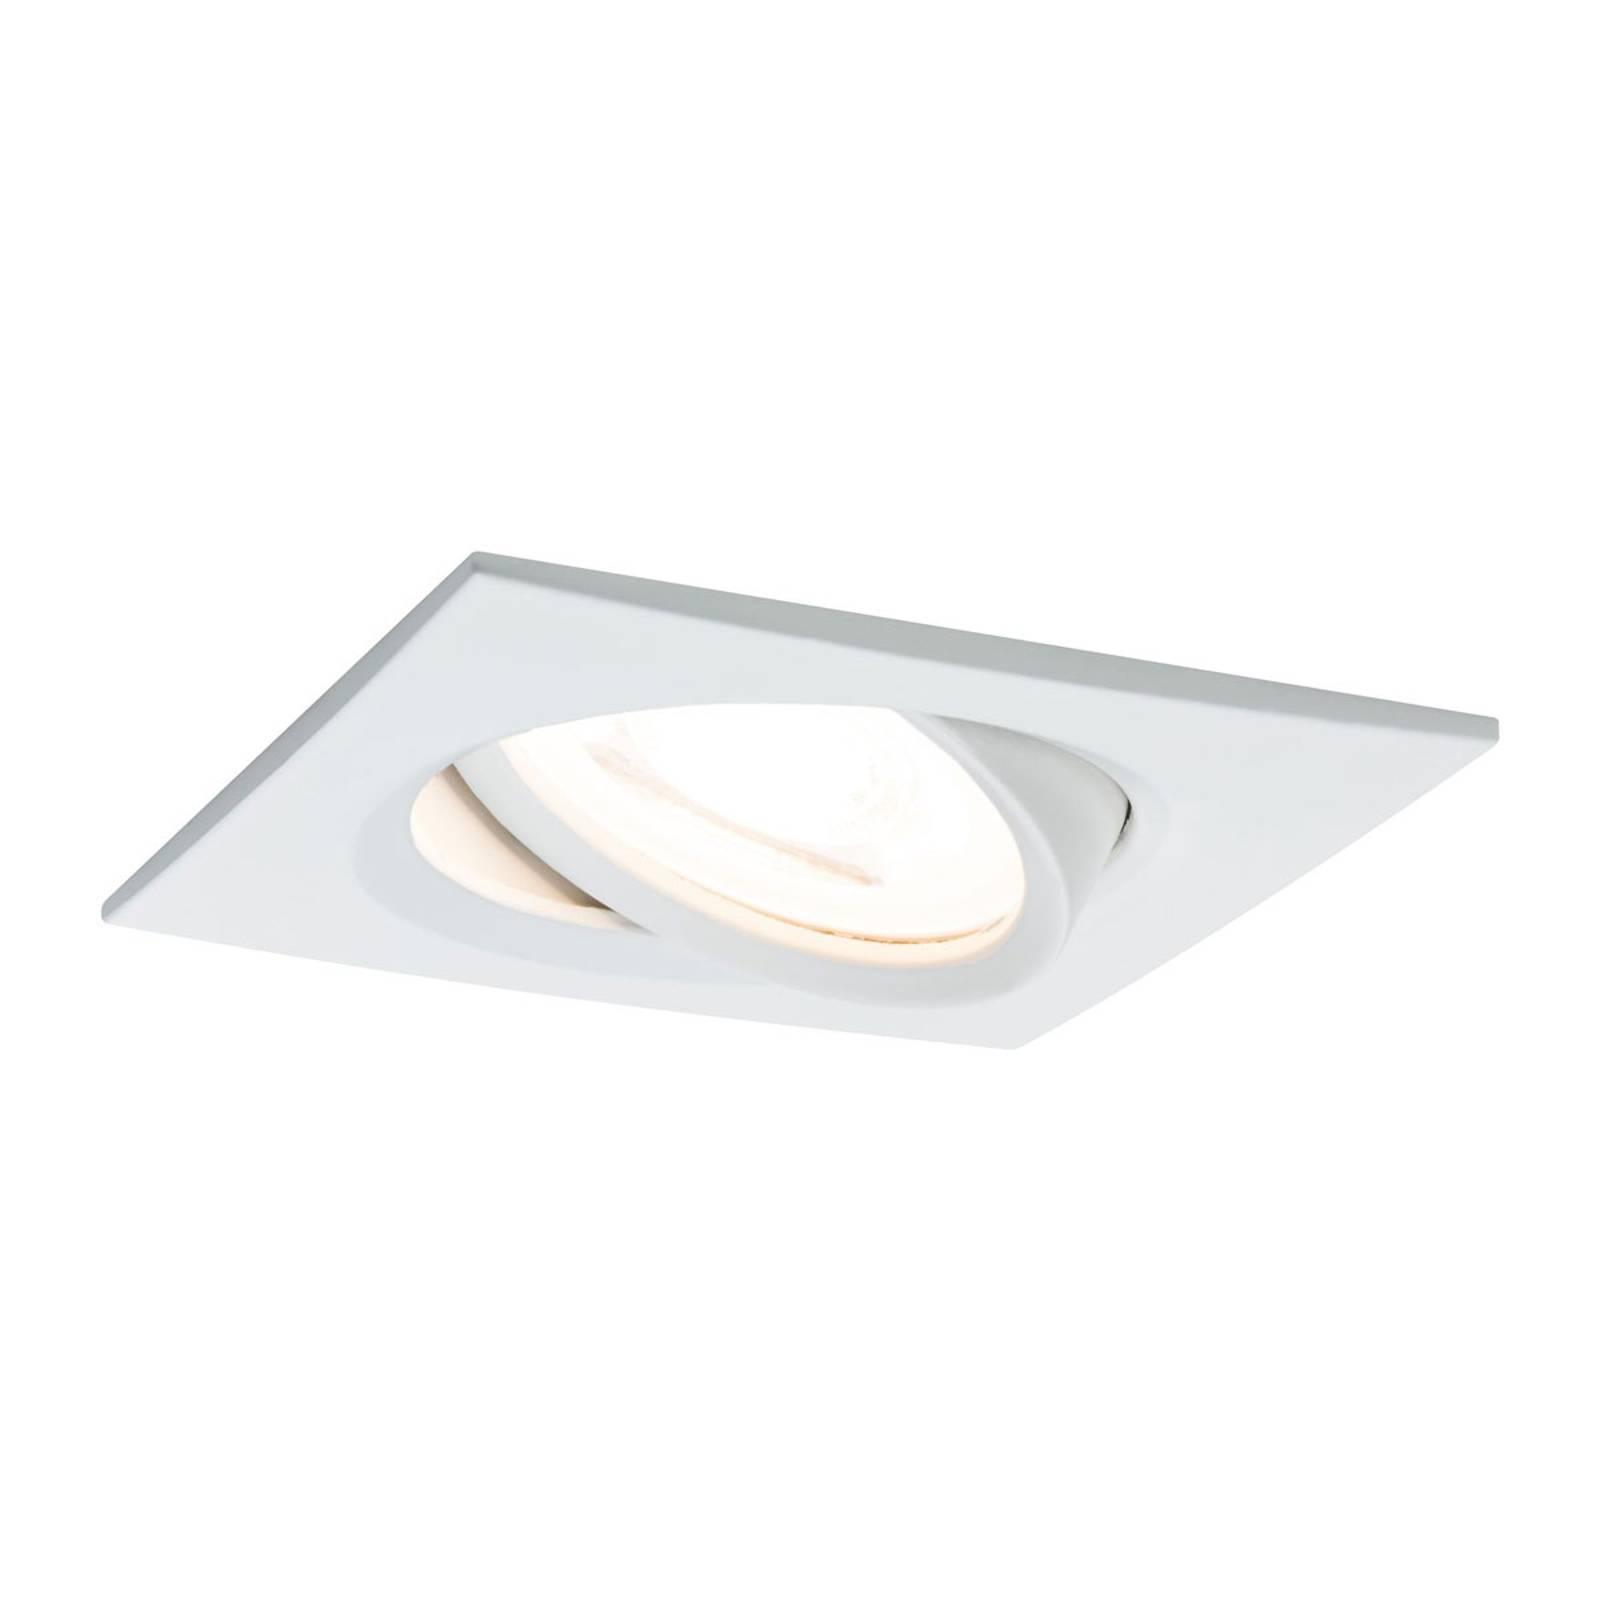 Paulmann LED-spotti Nova Coin kulmikas valkoinen